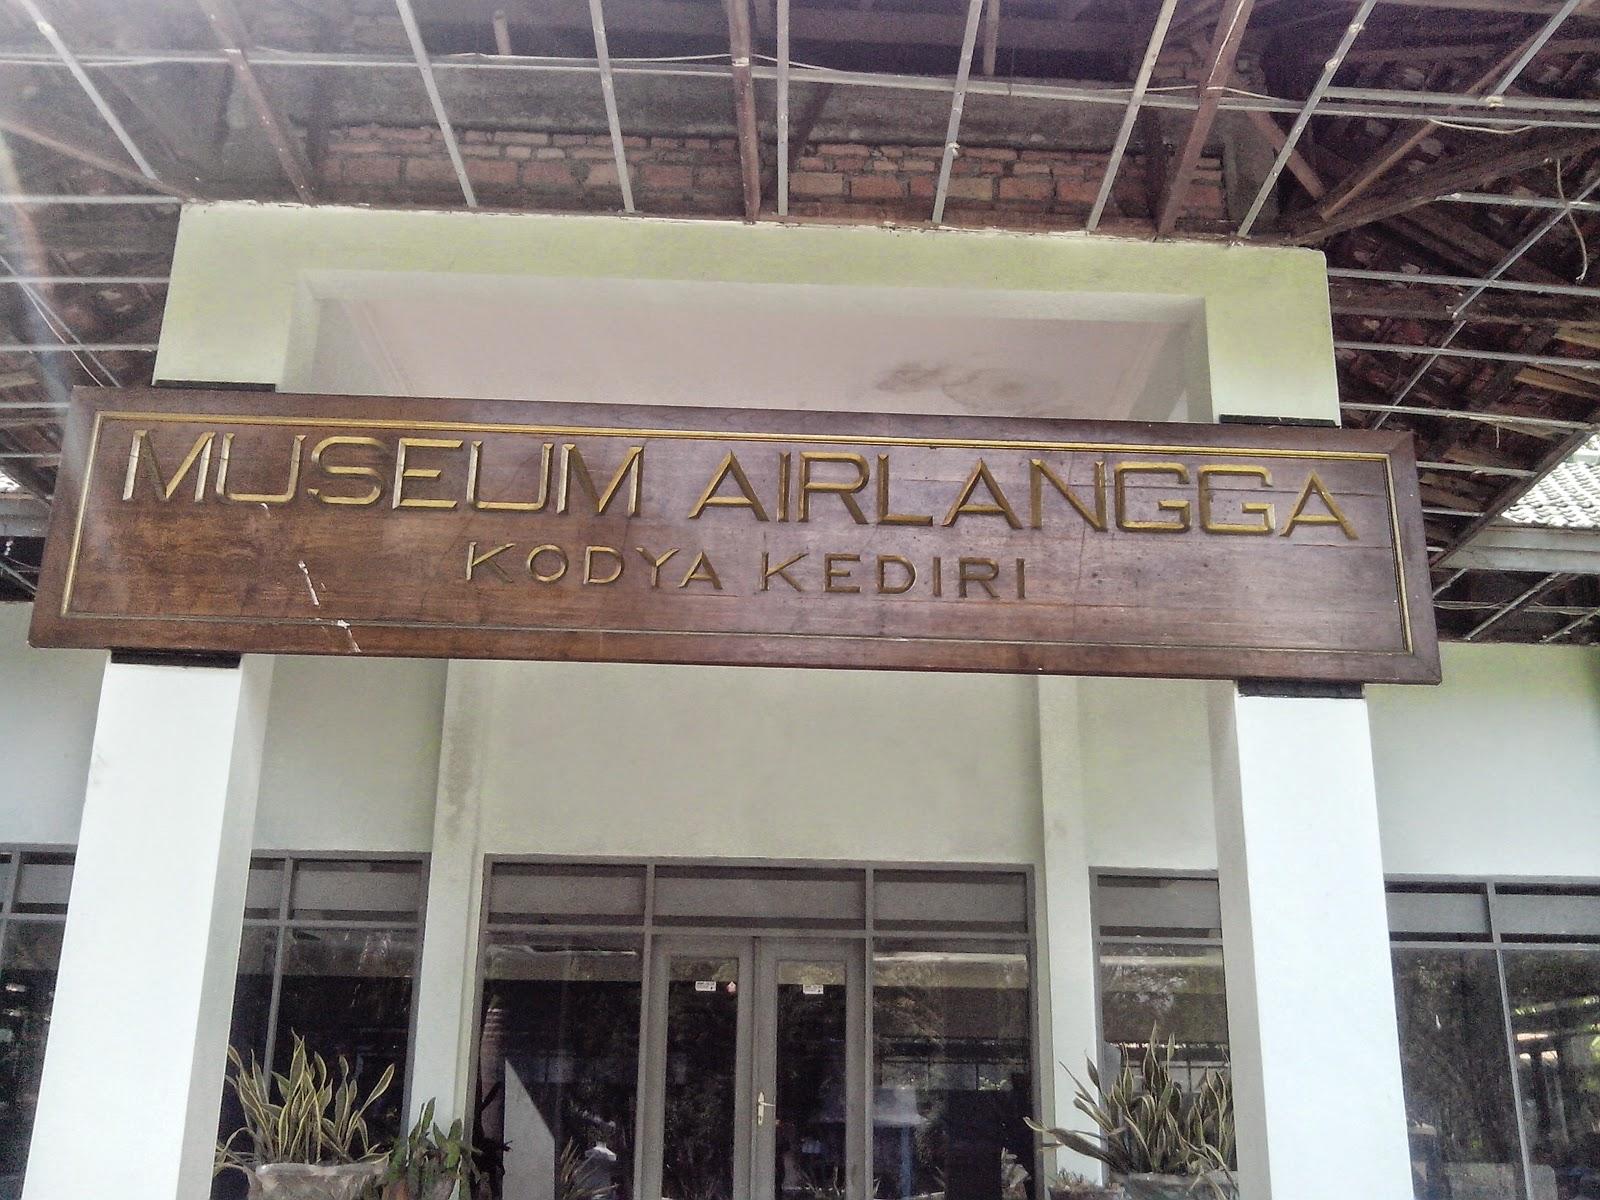 Wisata Sejarah Goa Selo Mangleng Kediri Negara Museum Airlangga Kodya